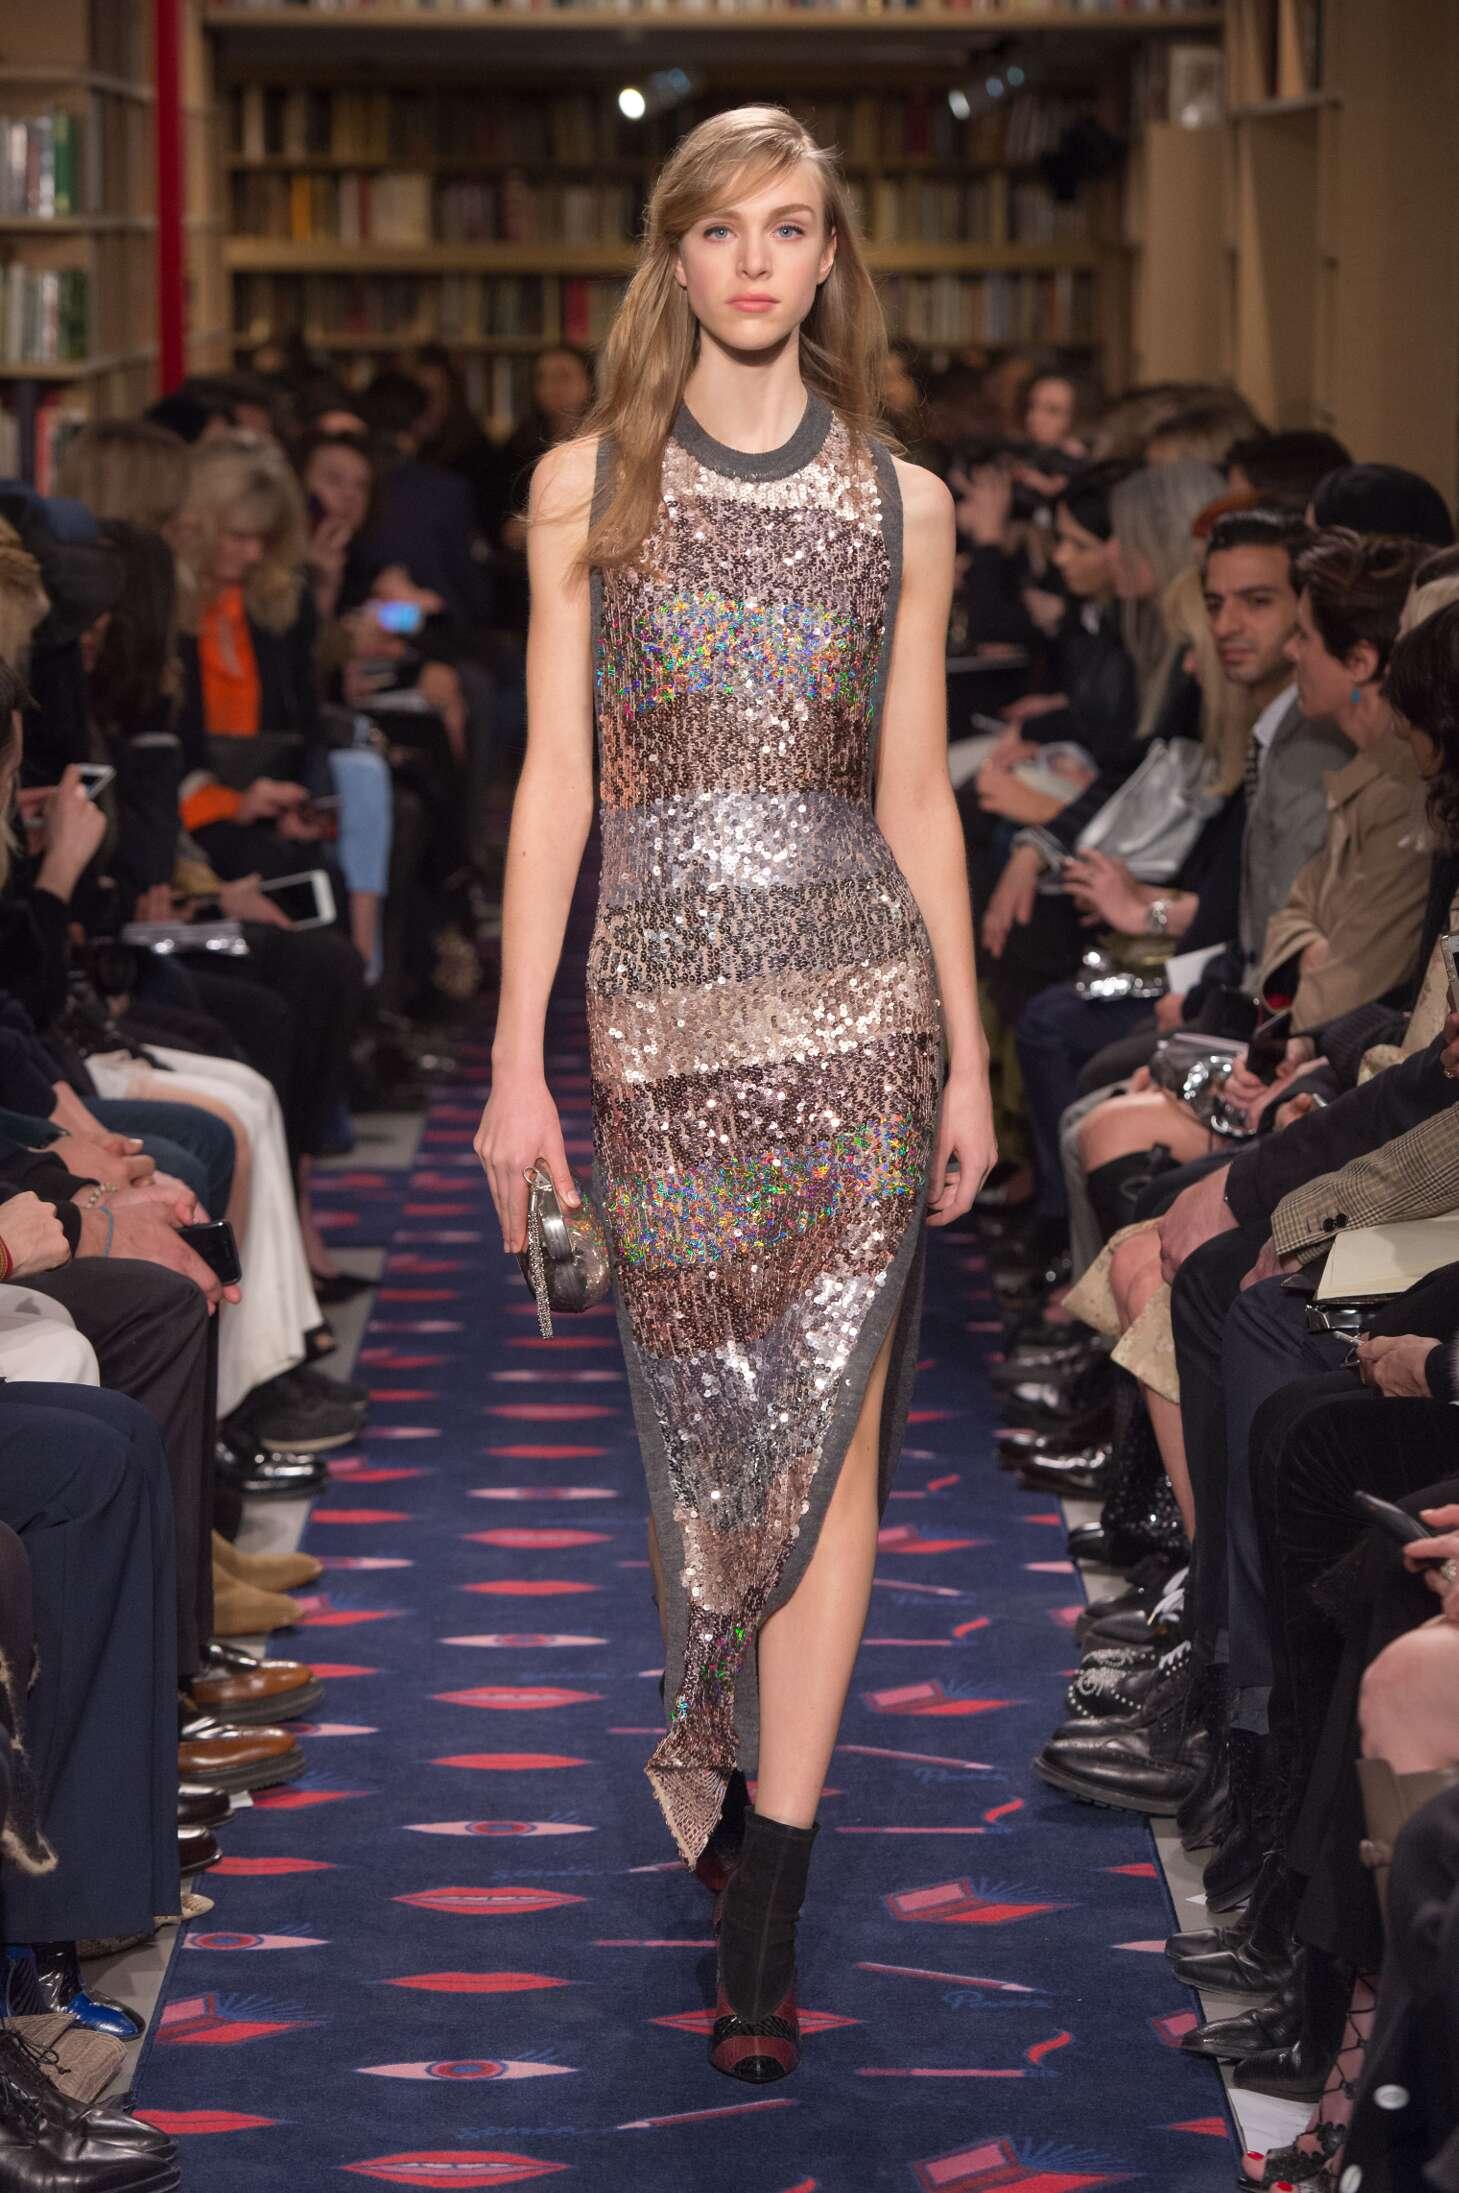 Fashion Show FW 2015 2016 Sonia Rykiel Womenswear